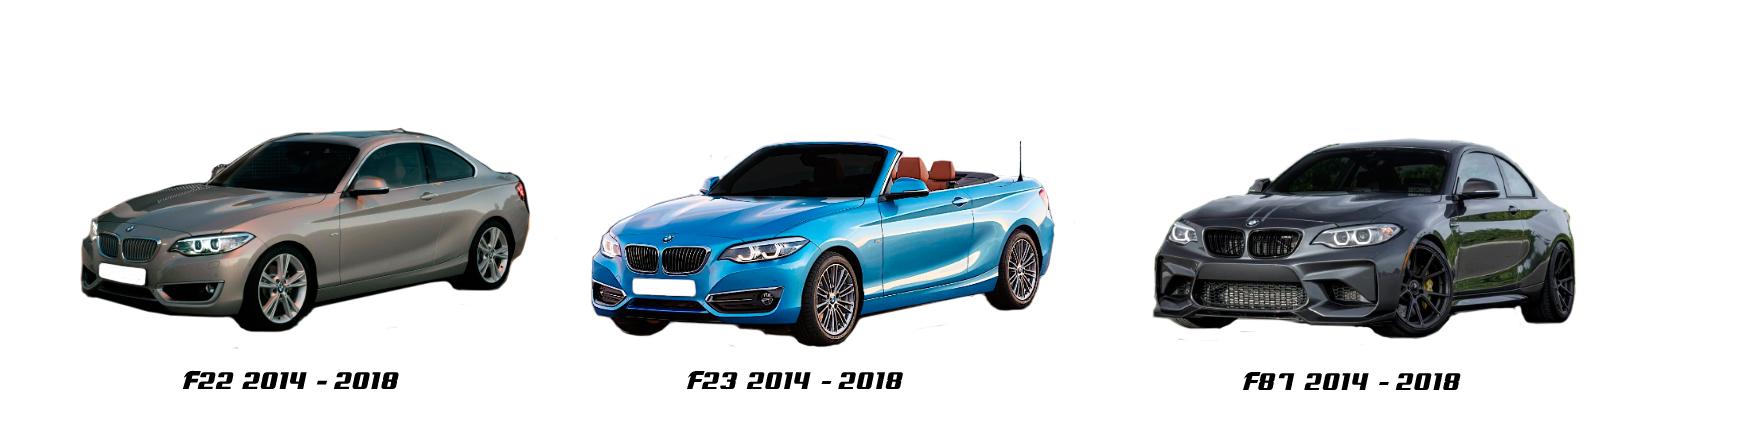 bmw serie 2 f22 f23 f87 de 2013 2014 2015 2016 2017